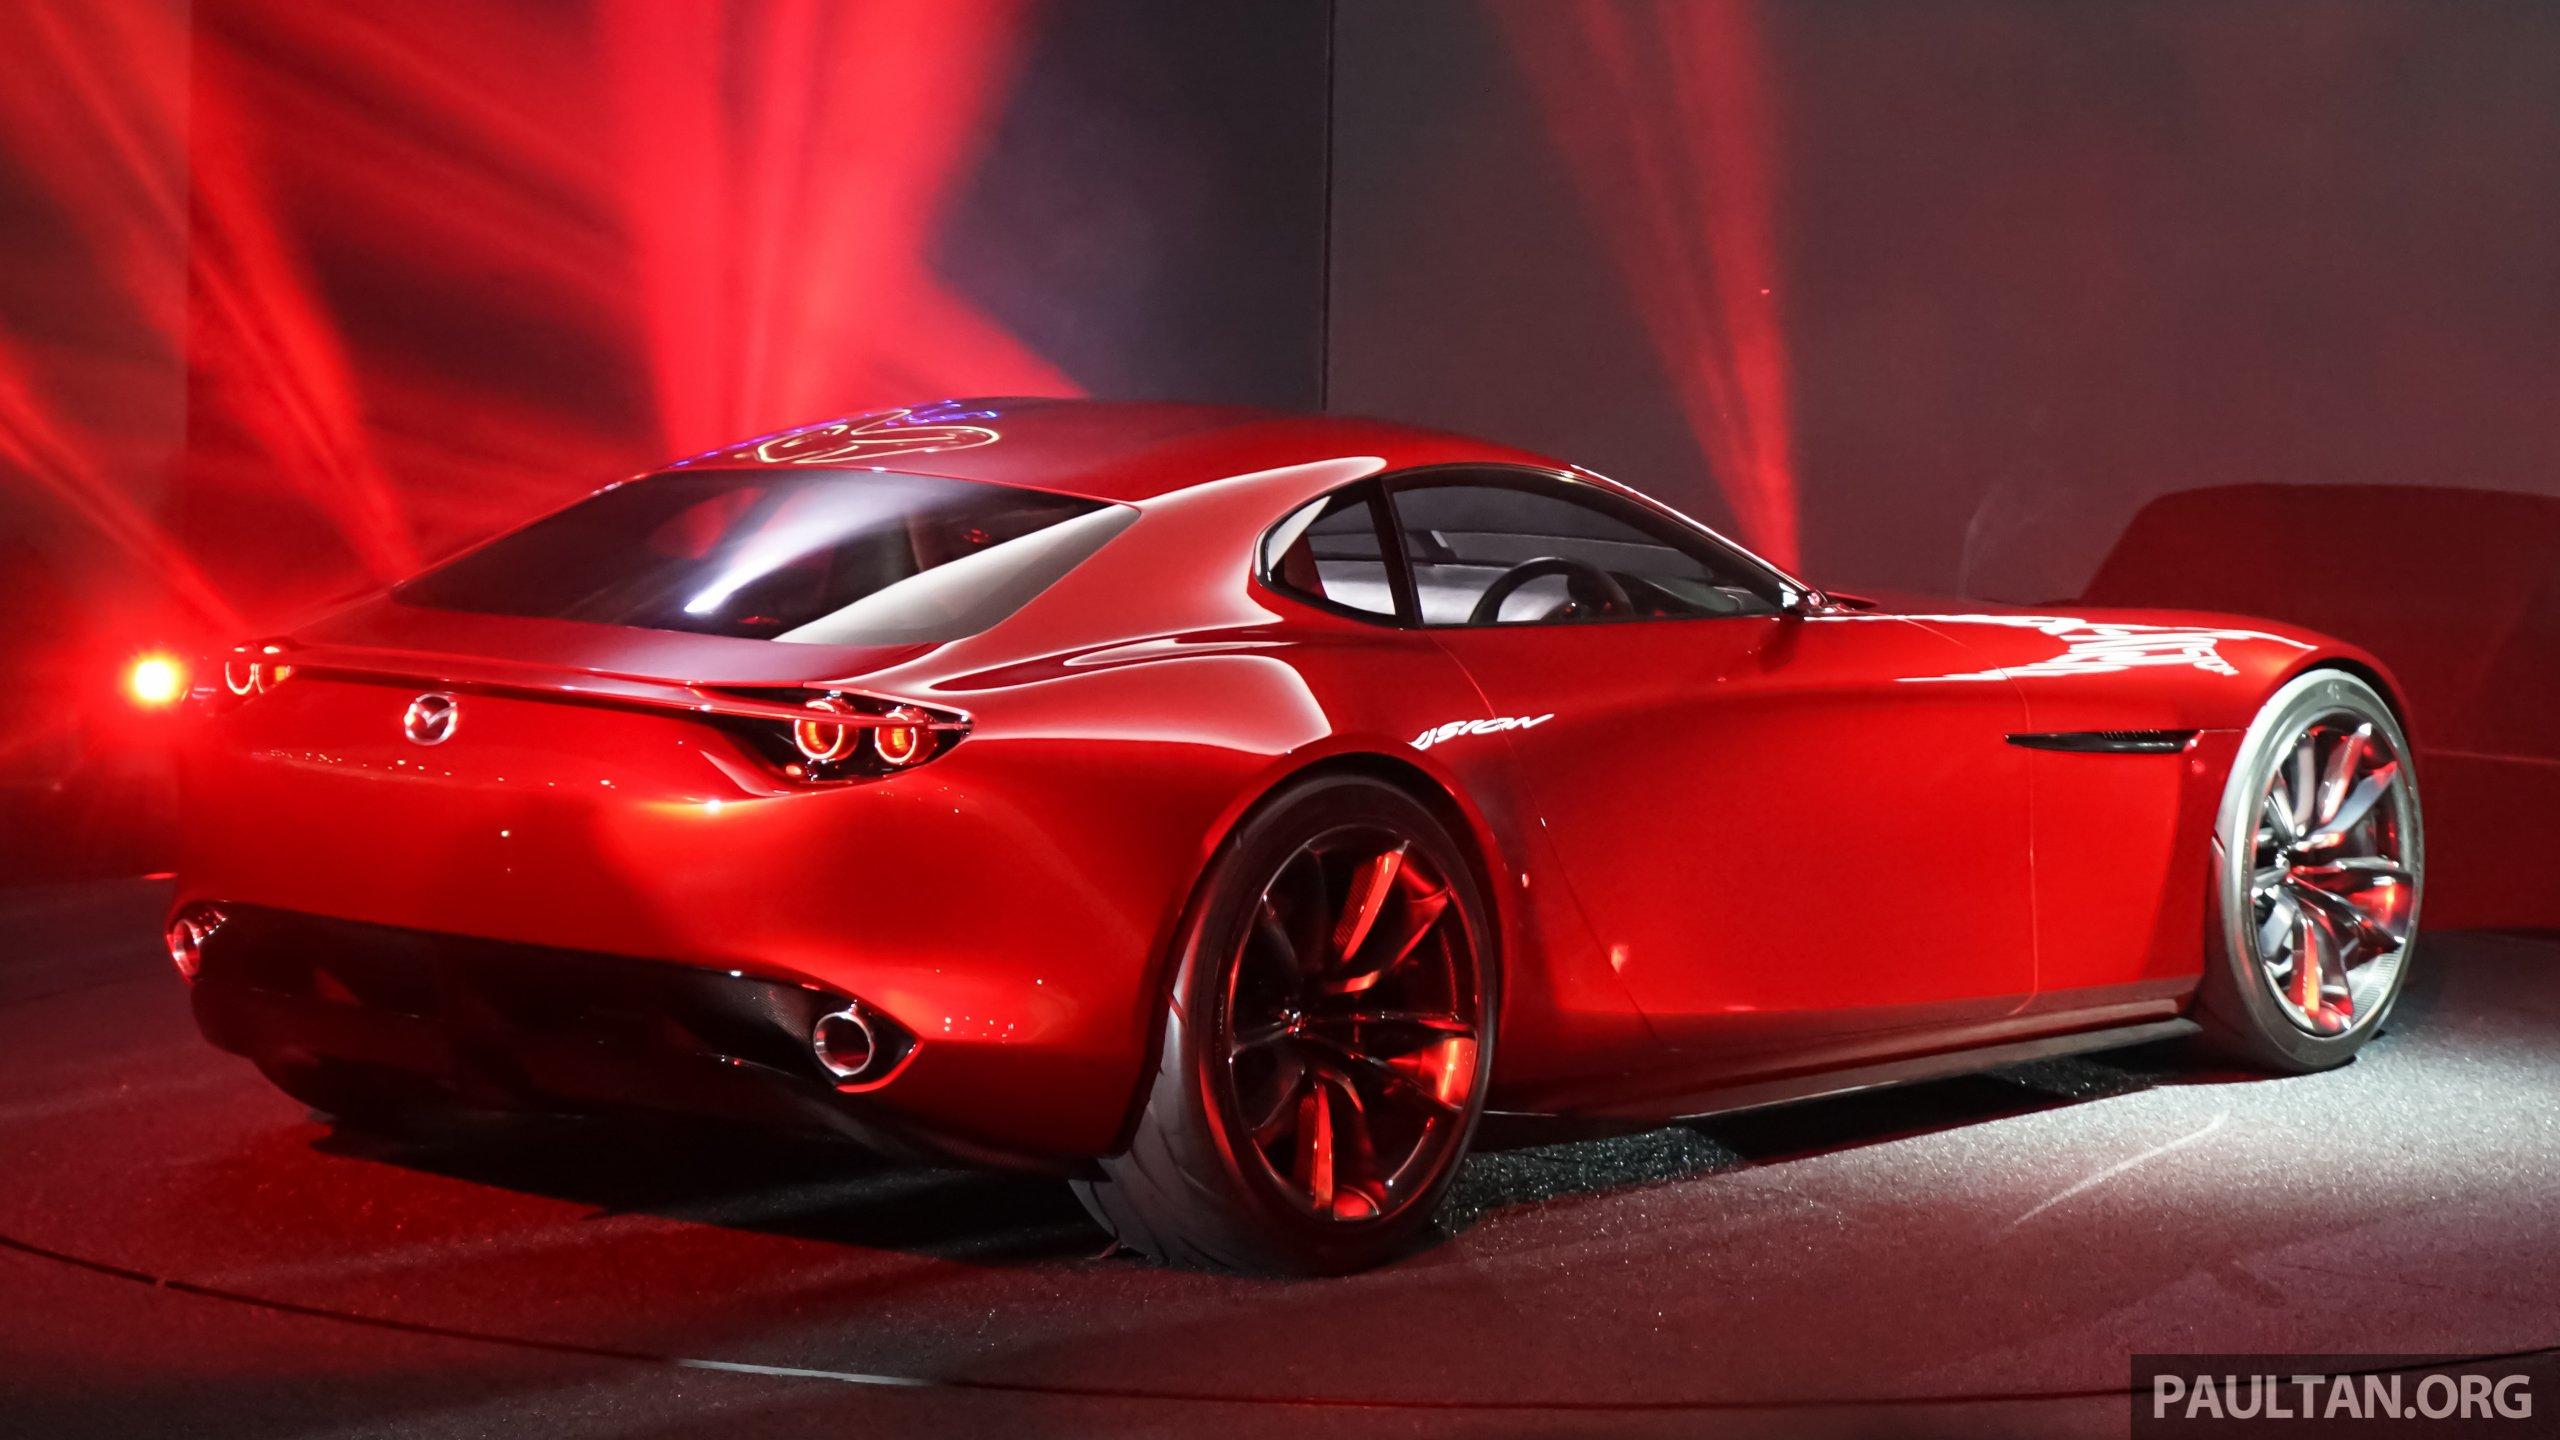 https://s2.paultan.org/image/2015/10/Mazda-RX-Vision-4.jpg